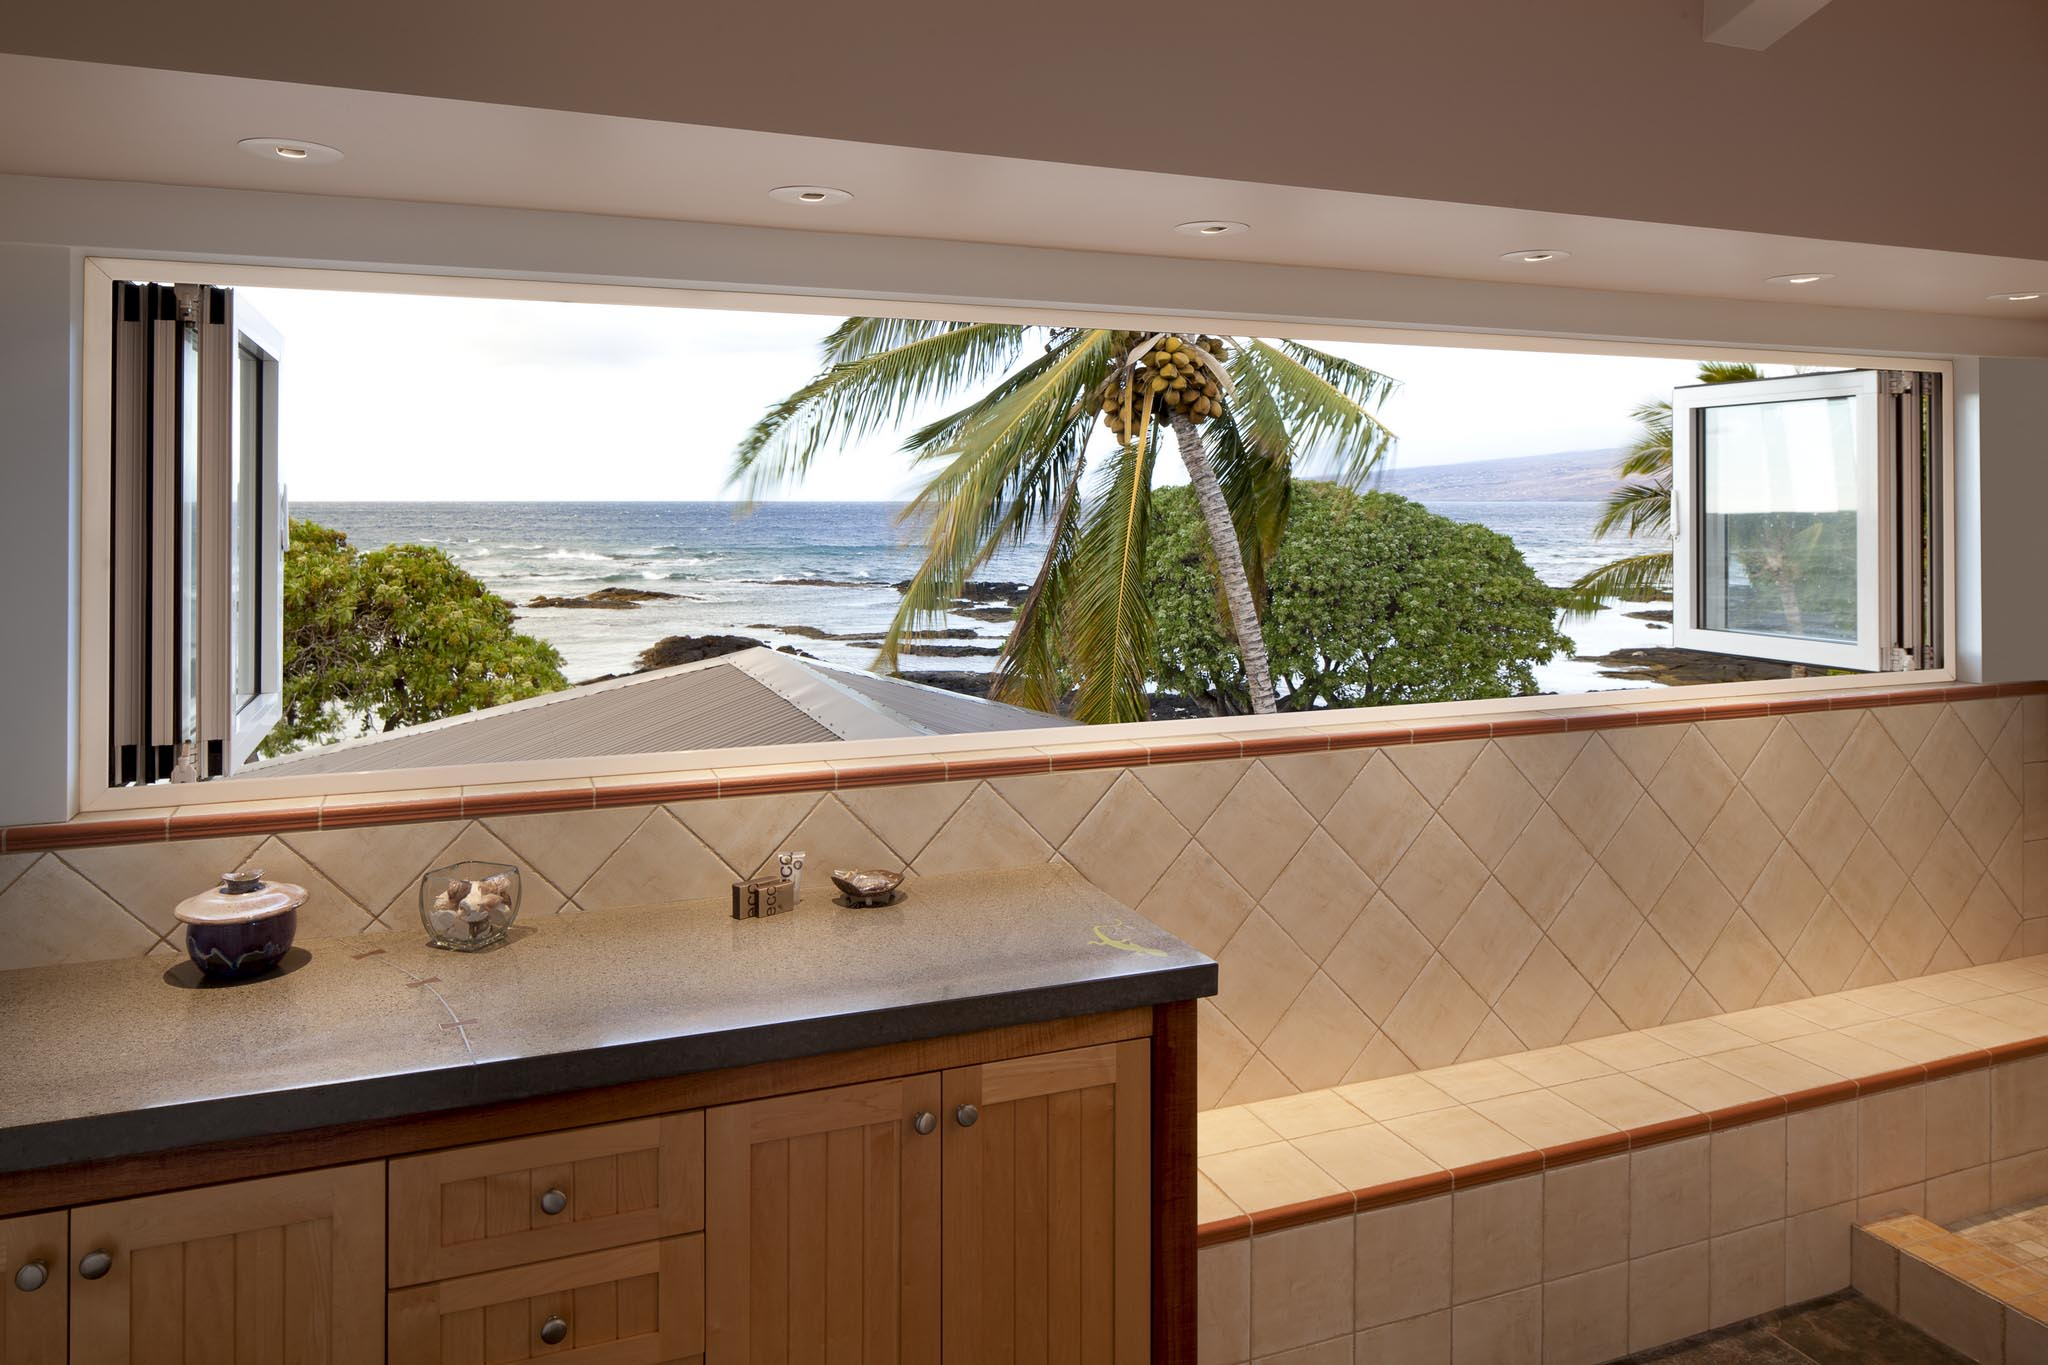 & Hawaii Coastal Residence | NanaWall Pezcame.Com